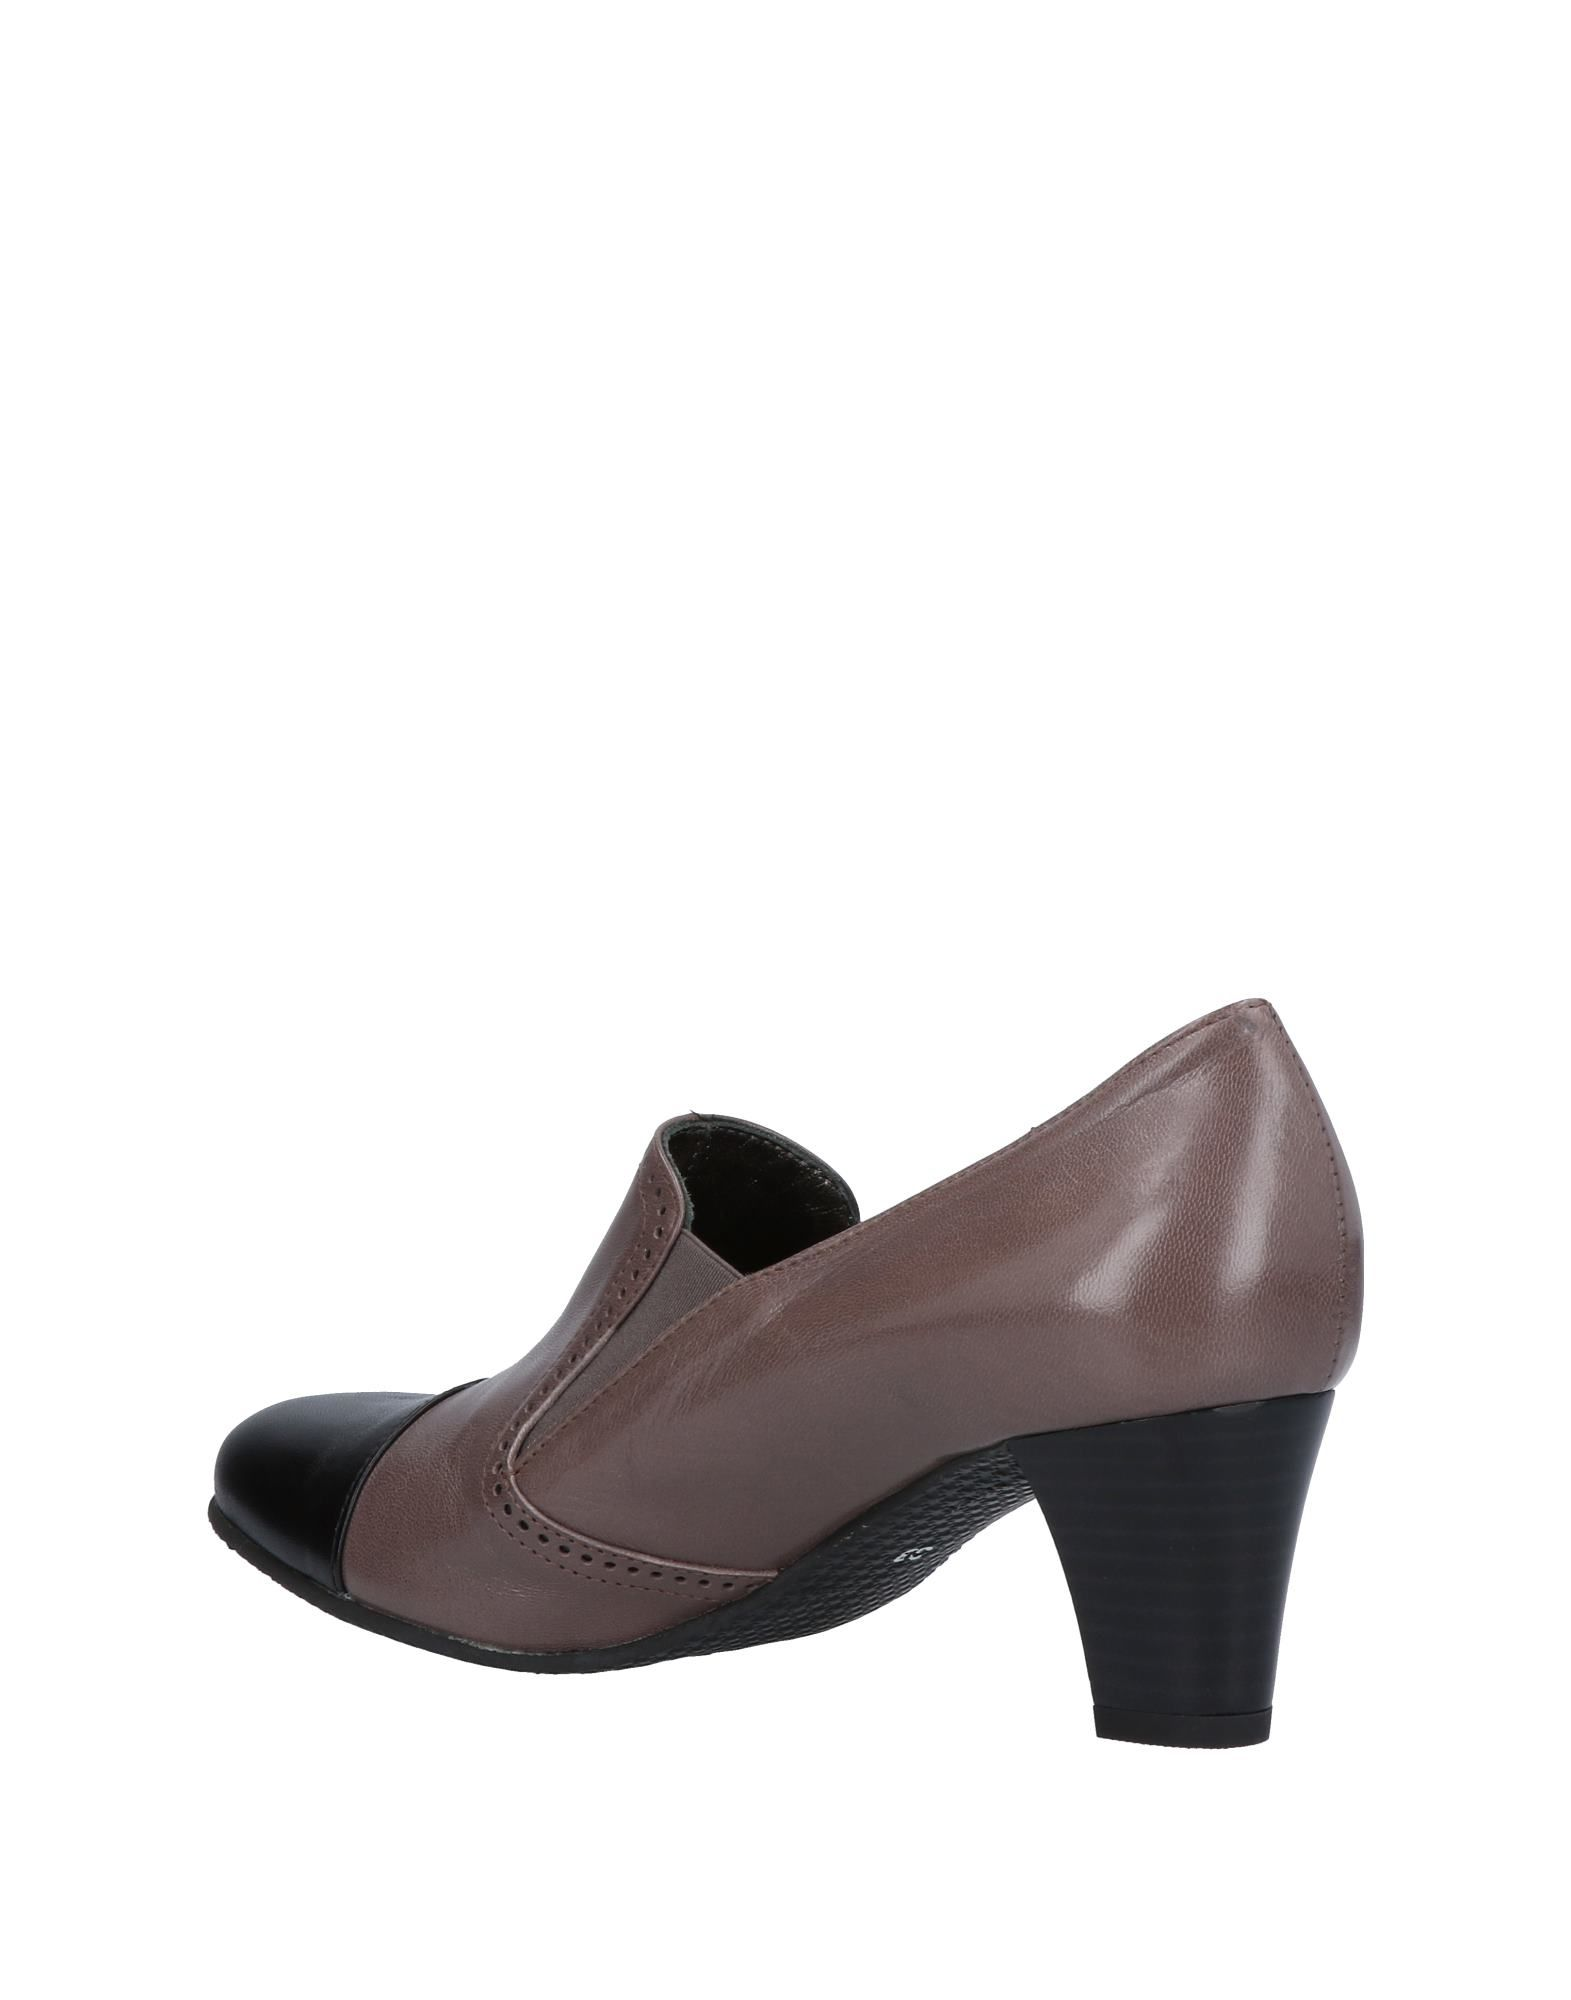 Alessia Guidi Mokassins Damen beliebte  11466783UE Gute Qualität beliebte Damen Schuhe 9e3126